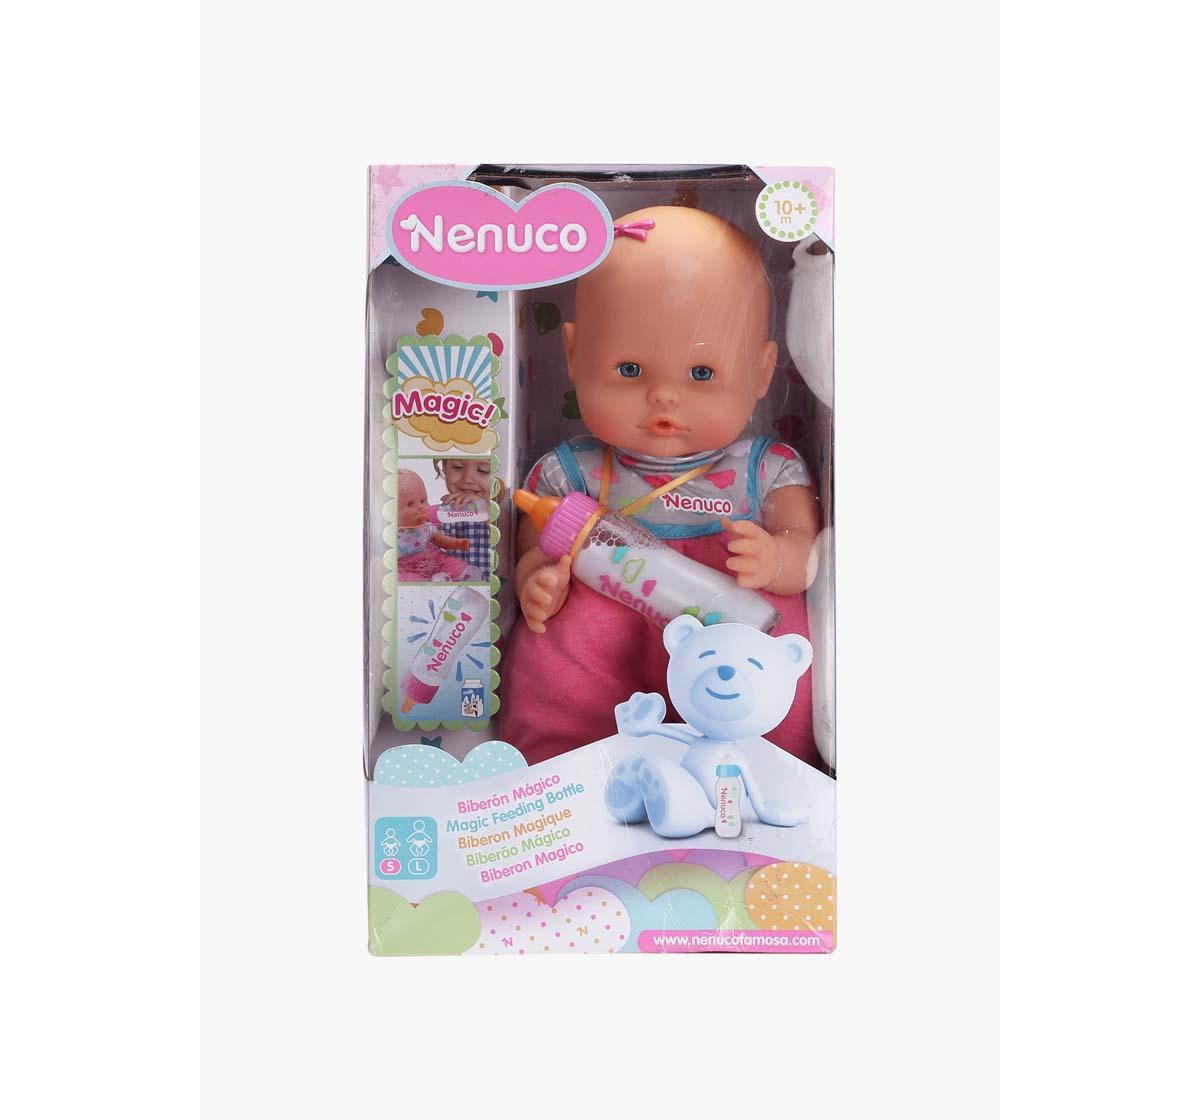 Nenuco | Brown Nenuco With Magic Feeding Bottle Dolls & Accessories for Girls age 10M+